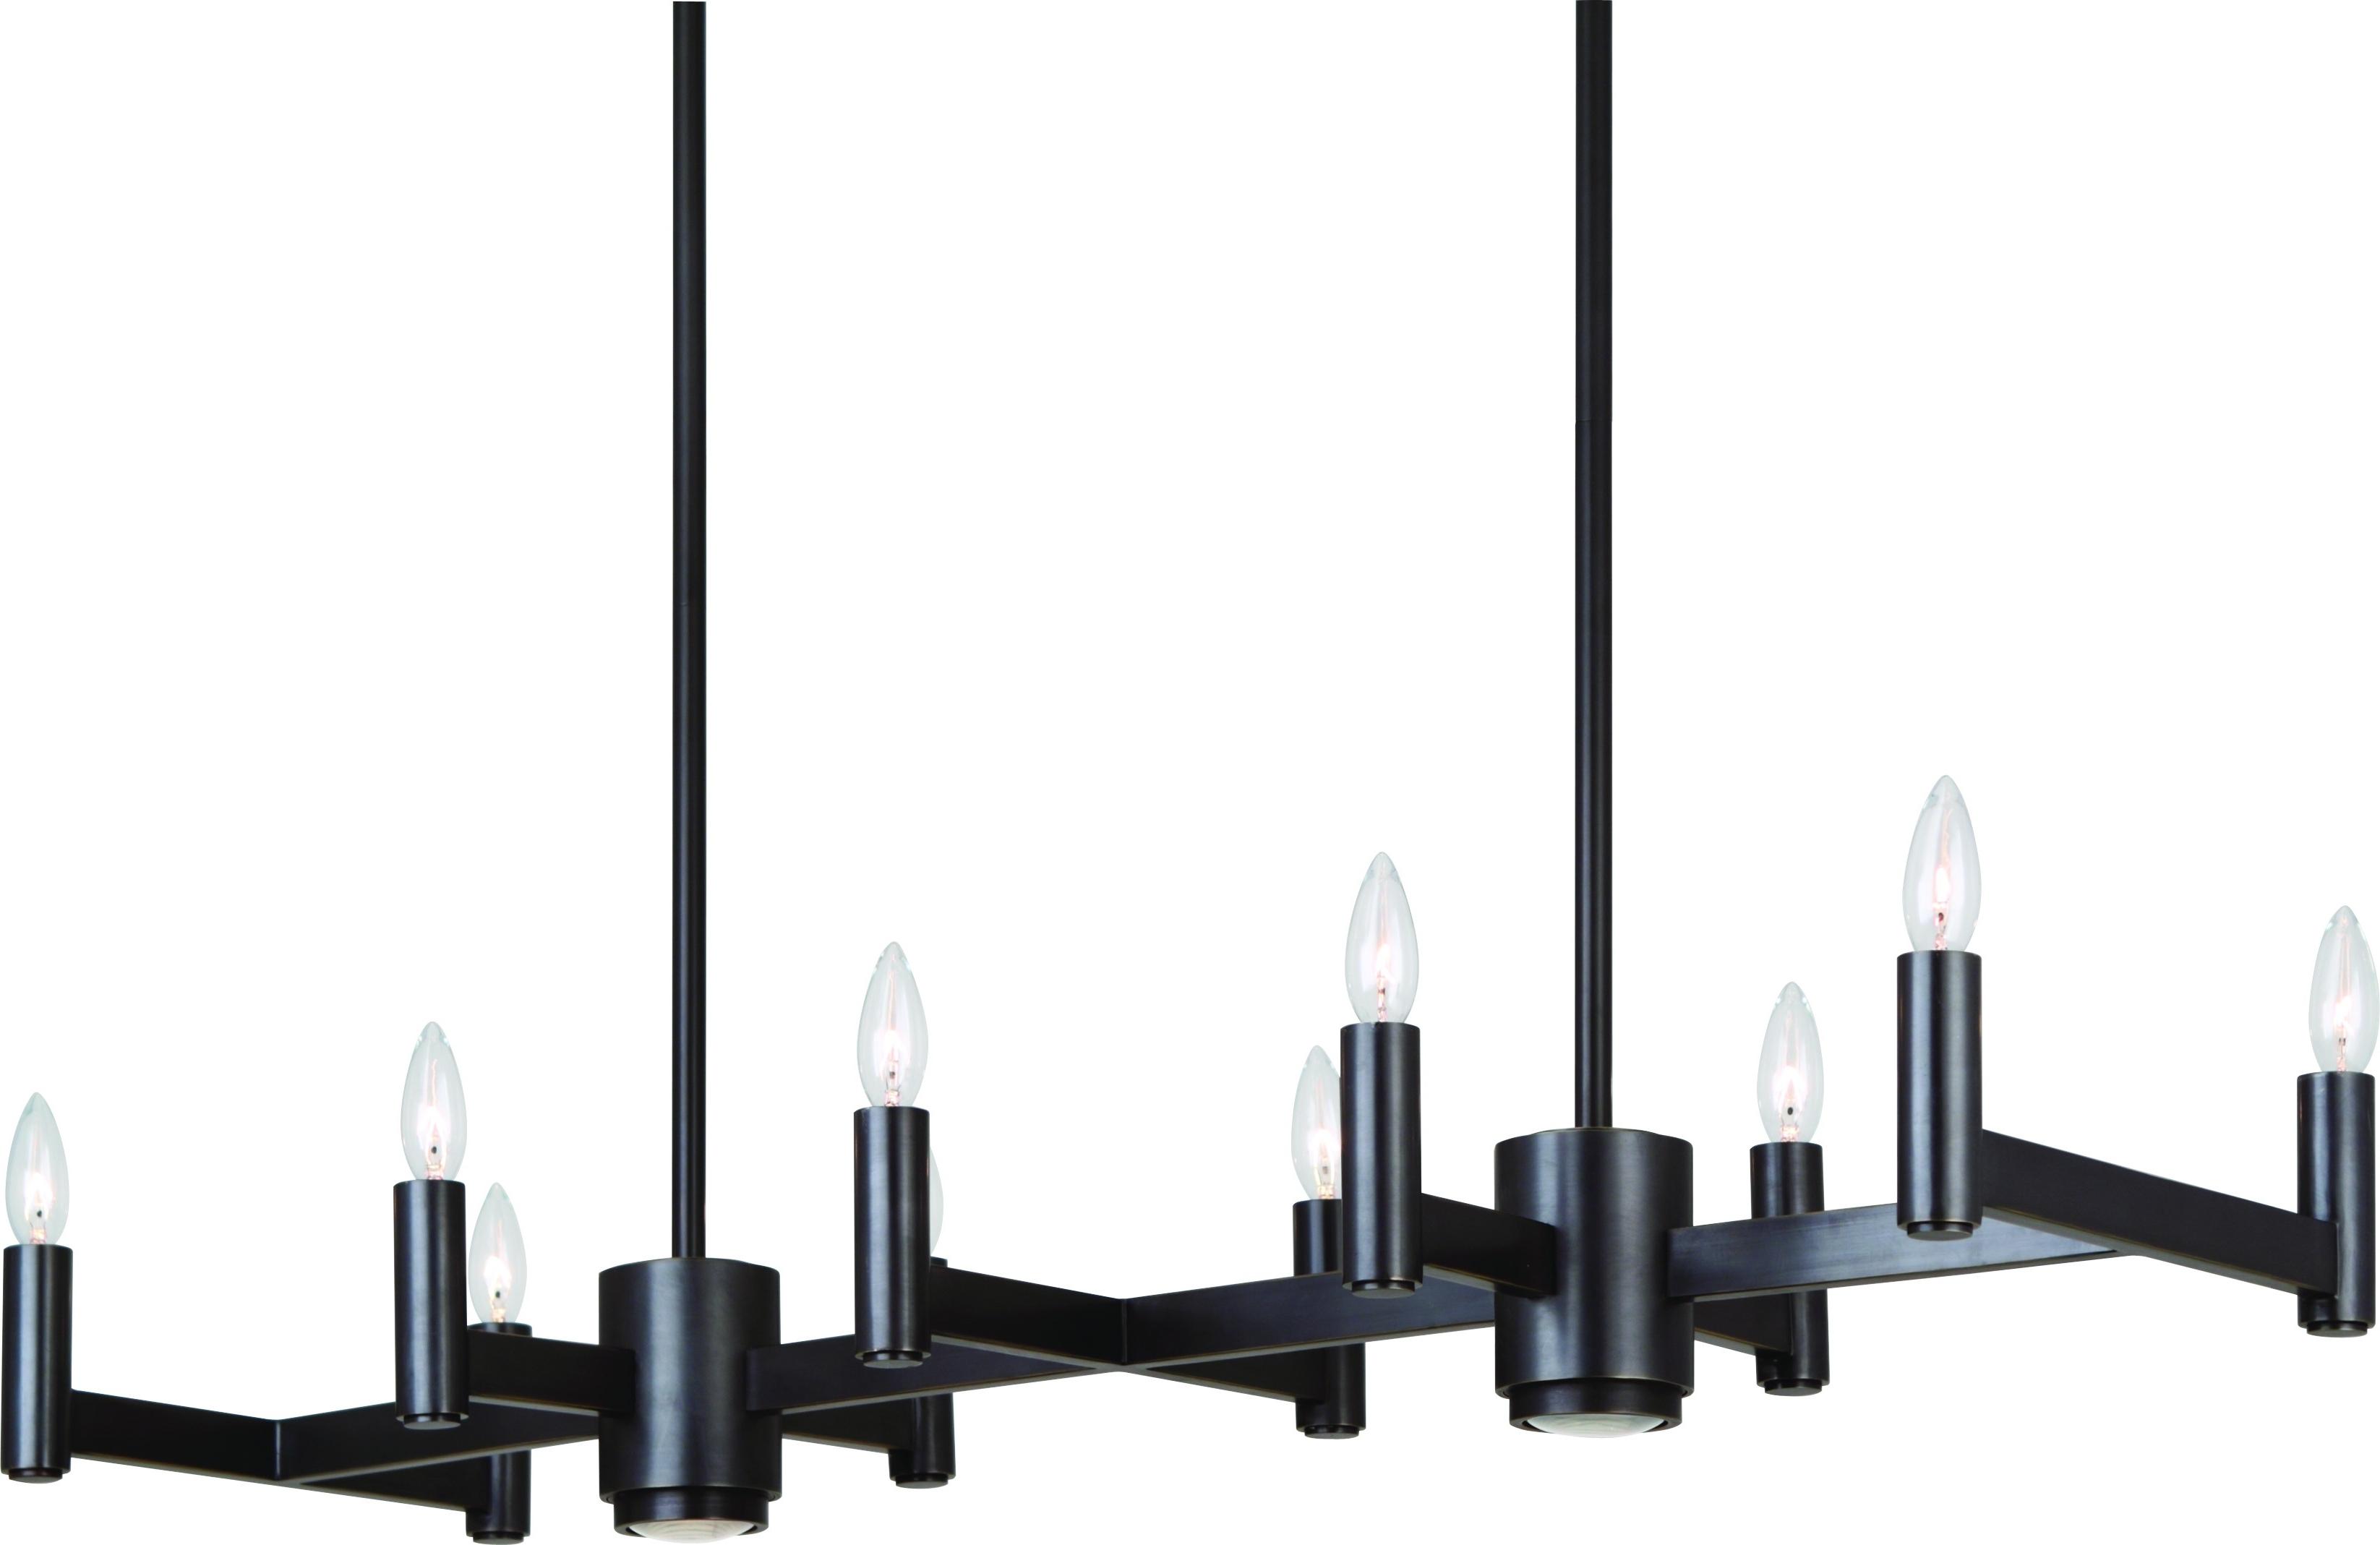 Black Contemporary Chandelier In Latest Home Design : Good Looking Black Modern Chandelier Brilliant Design (View 3 of 20)